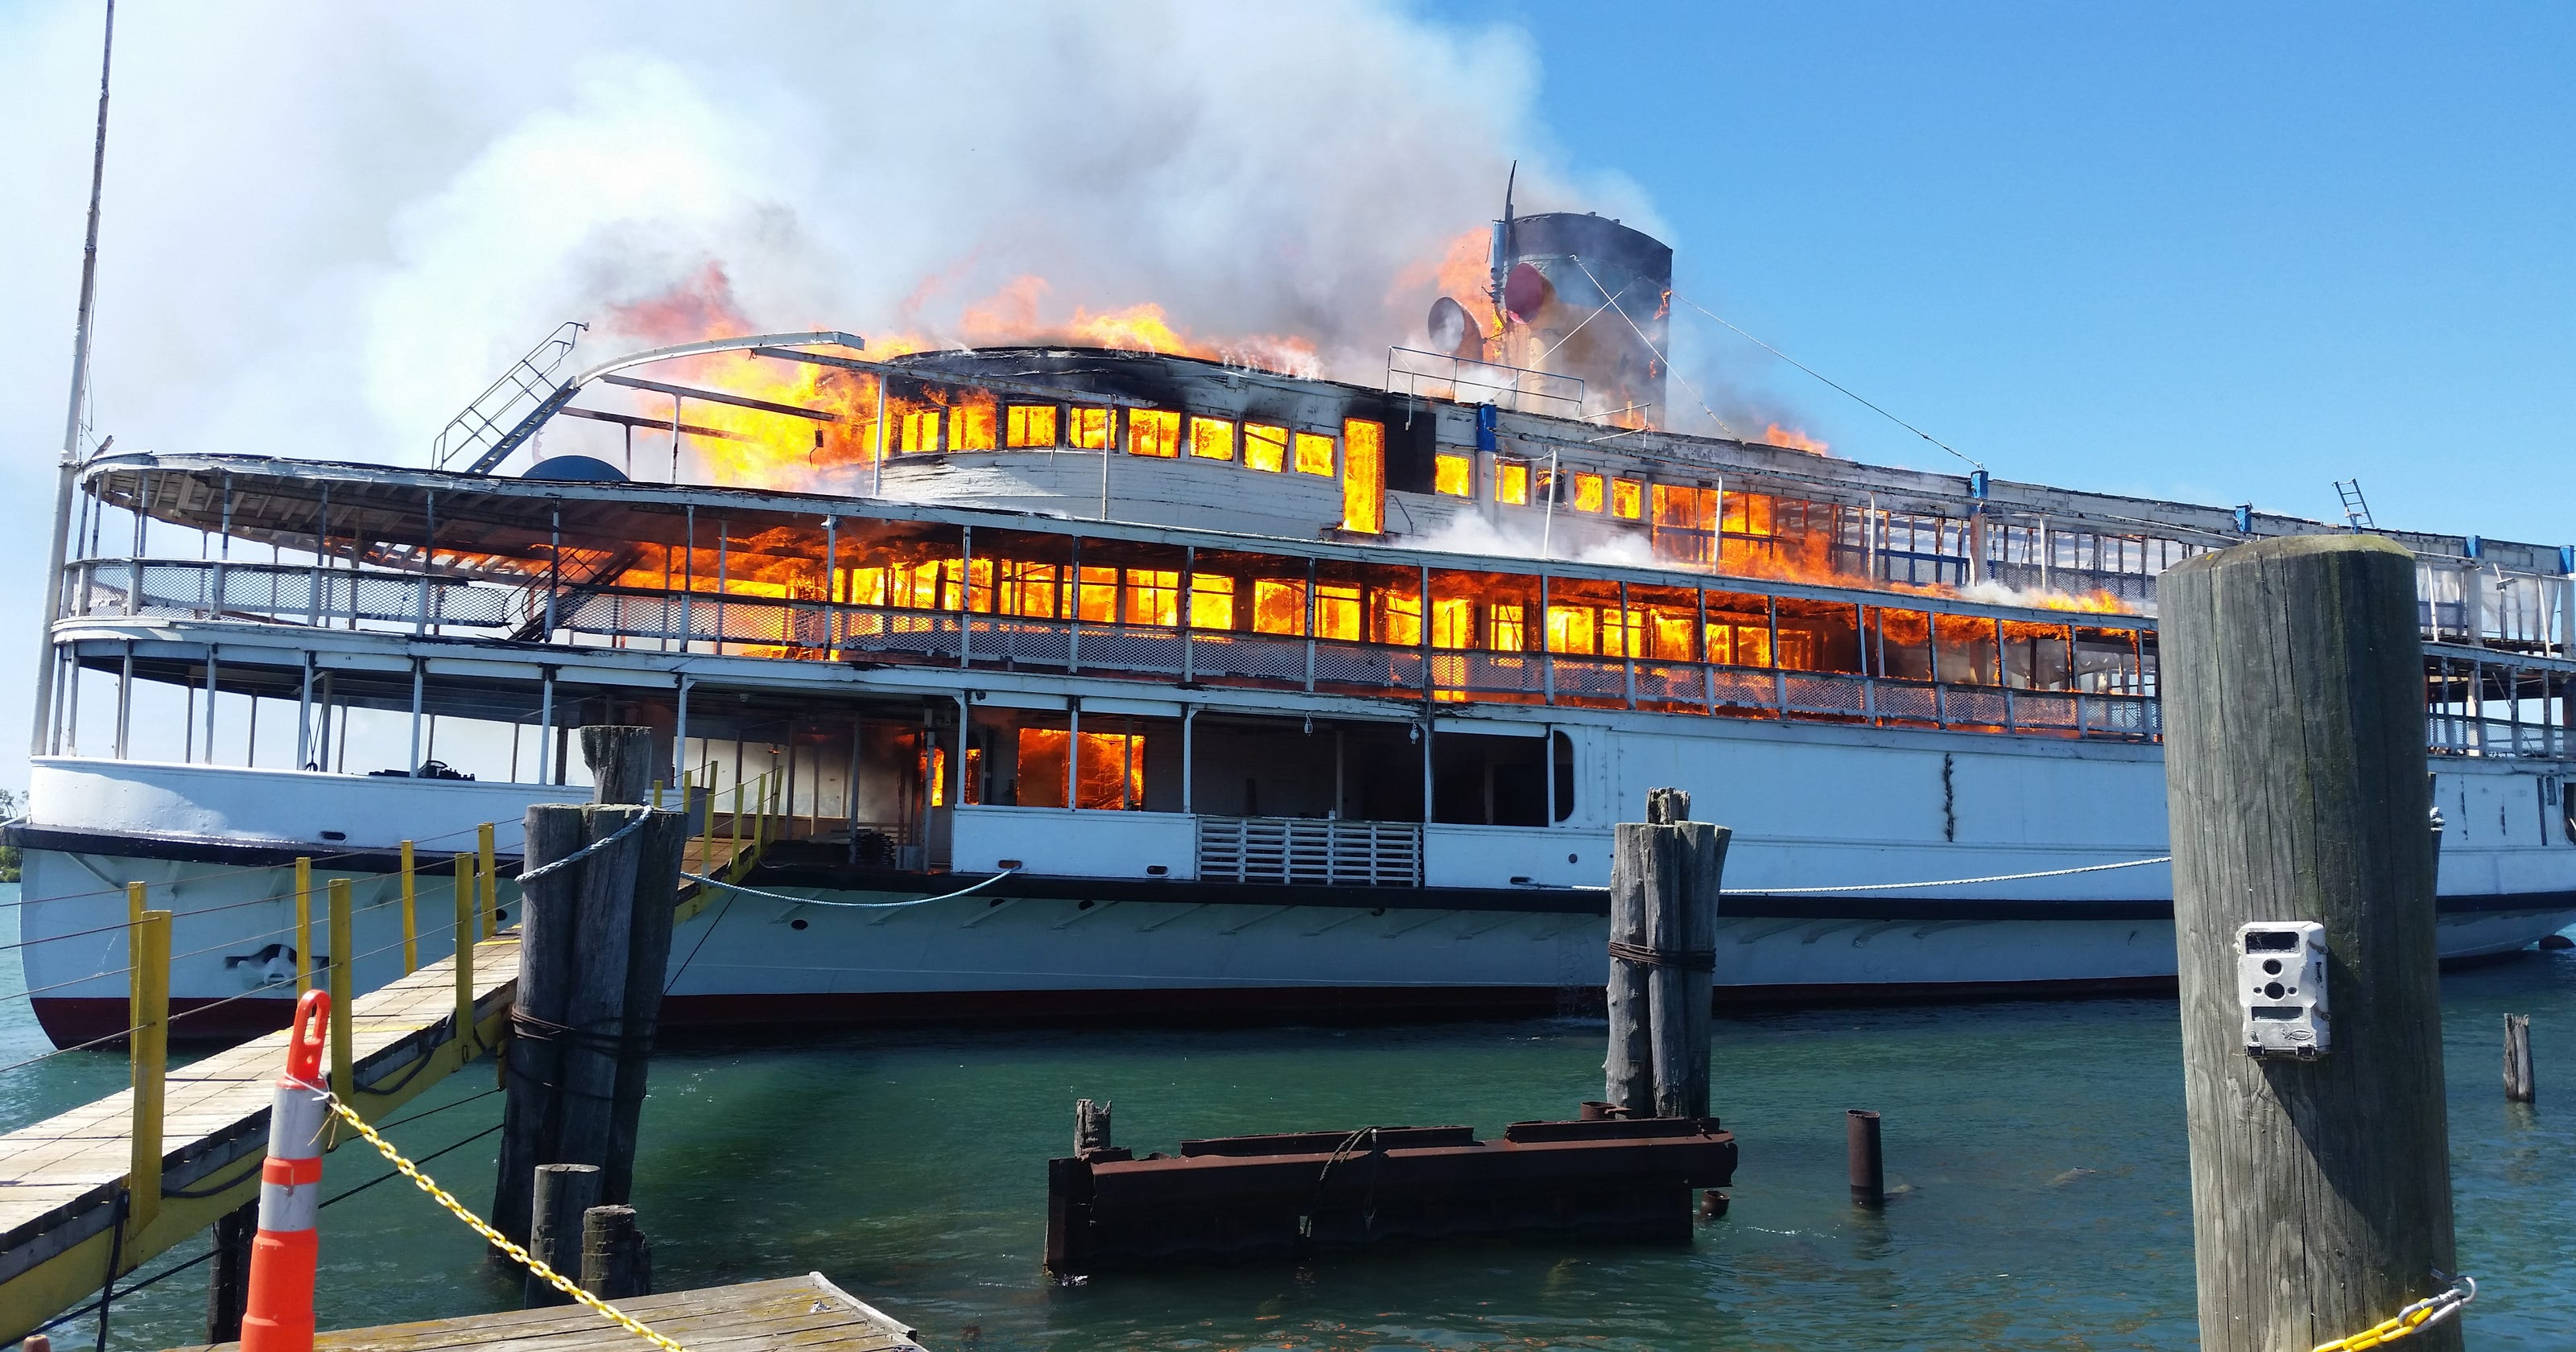 Fire Destroys Former Boblo Boat At Detroit Marina